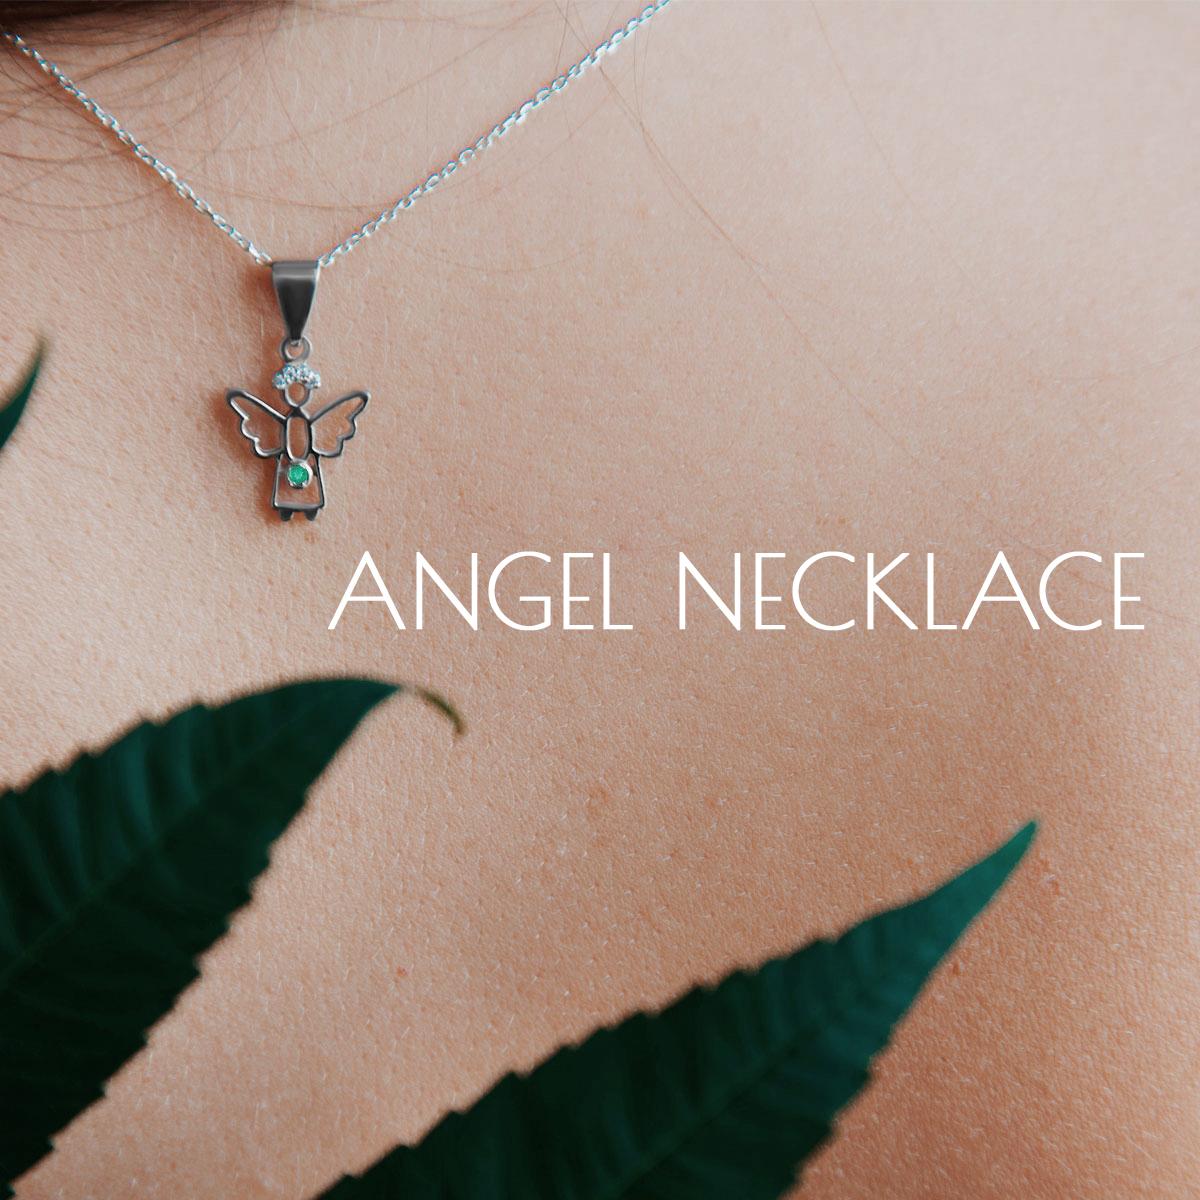 Підвіска янголя з смарагдом і діамантами 'Gentle angel'